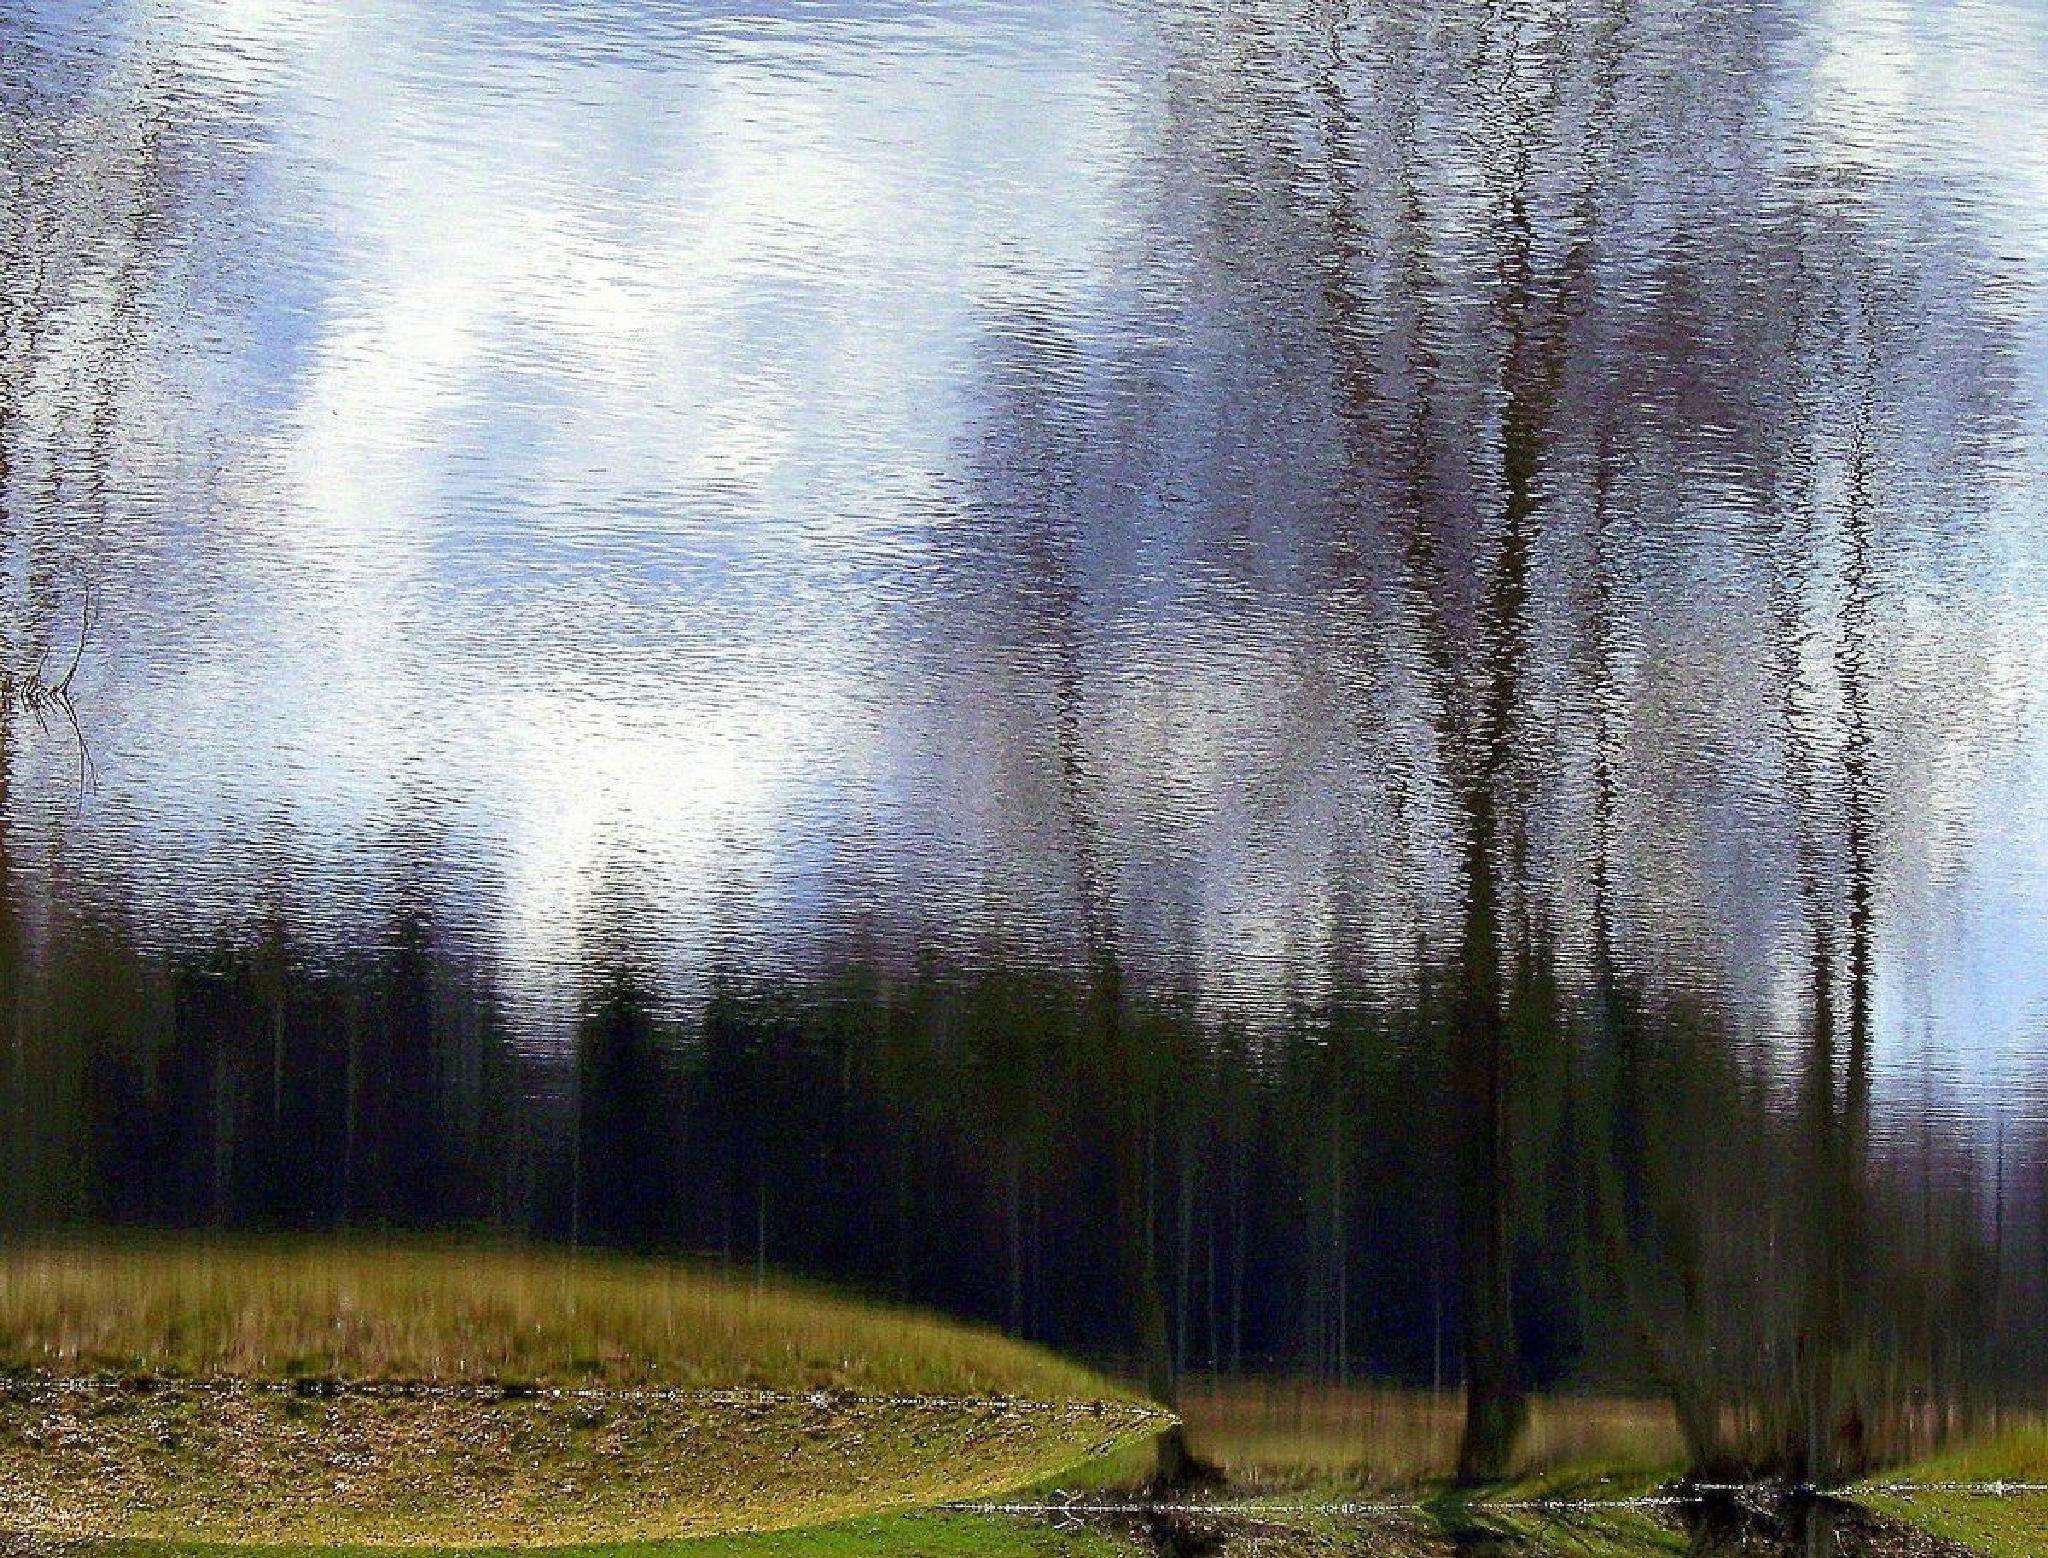 Untitled by Emilija Va